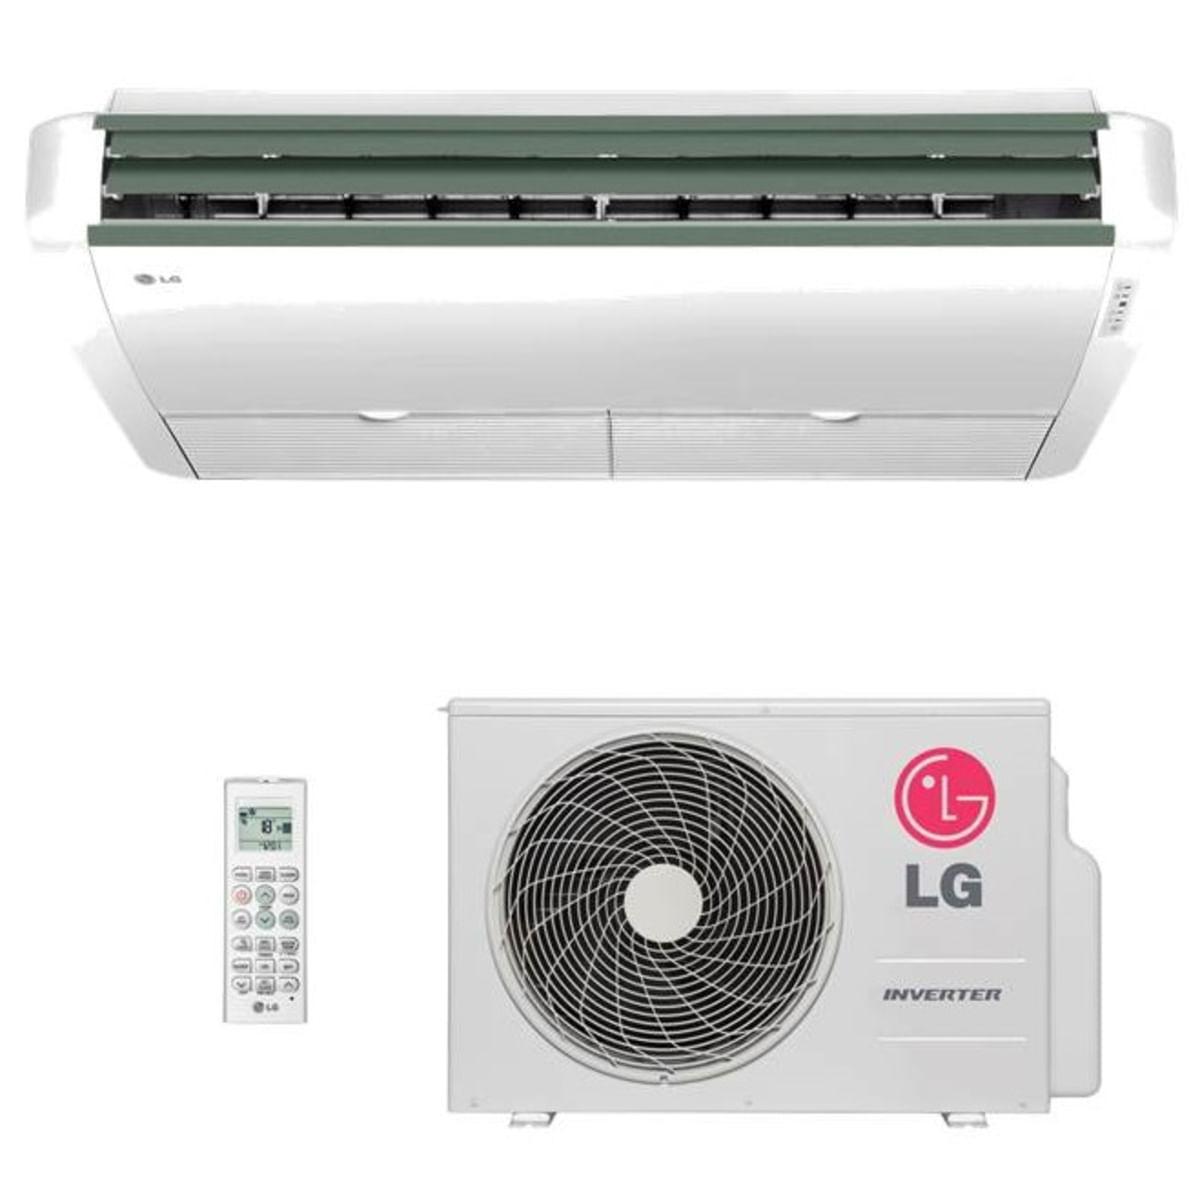 Ar-Condicionado-Split-LG-Teto-Inverter-17.000-BTU-h-Frio-AV-Q18GJLA0-Conjunto